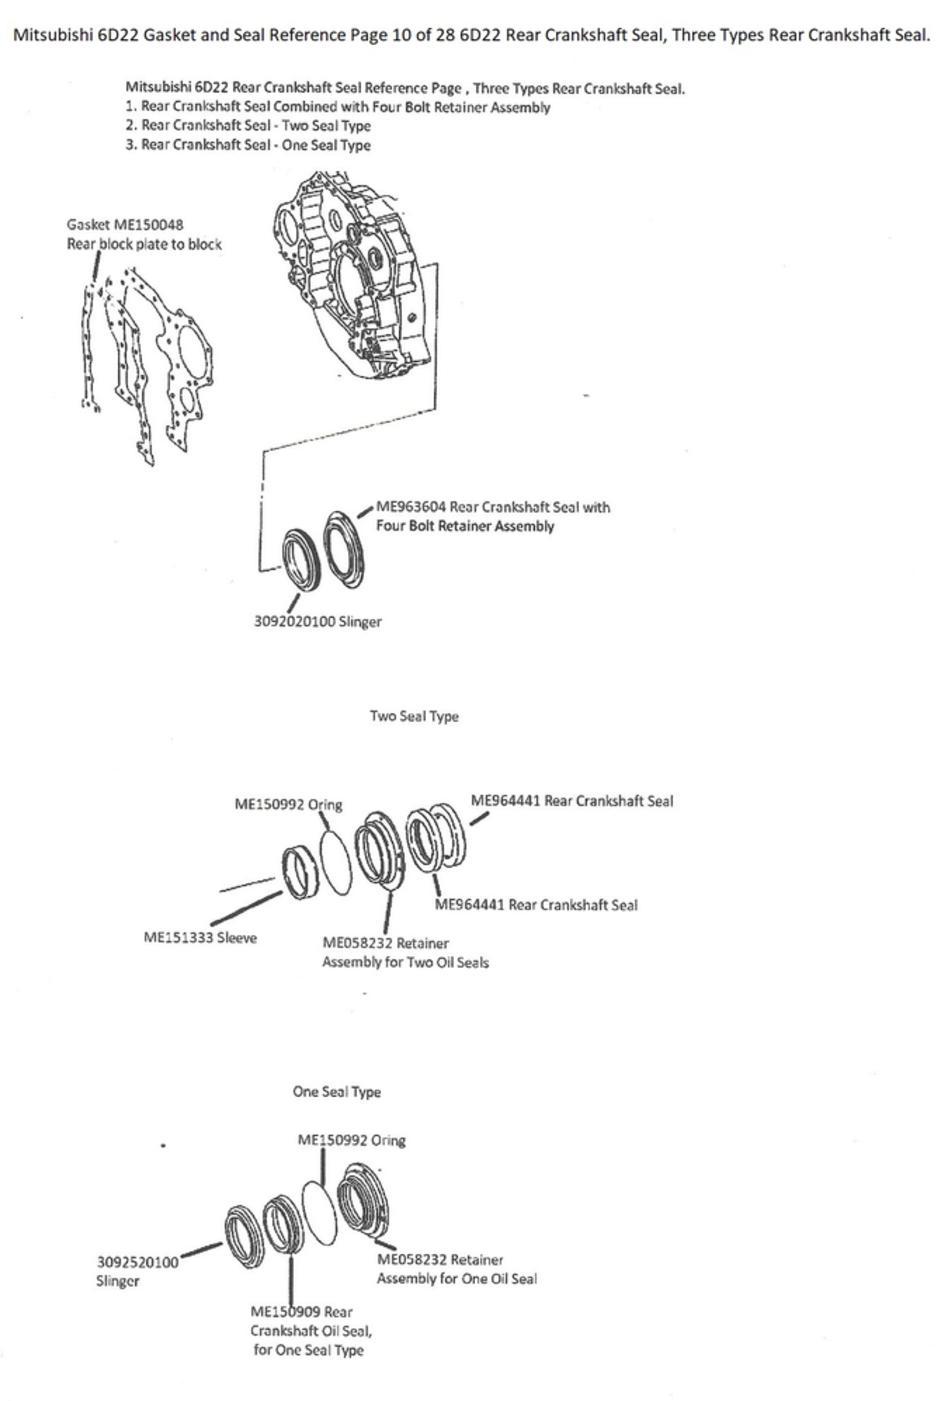 Mitsubishi 6D22 Gasket and Seal Reference Page 10 of 28 6D22 Rear  Crankshaft Seal, Three Types Rear Crankshaft Seal.